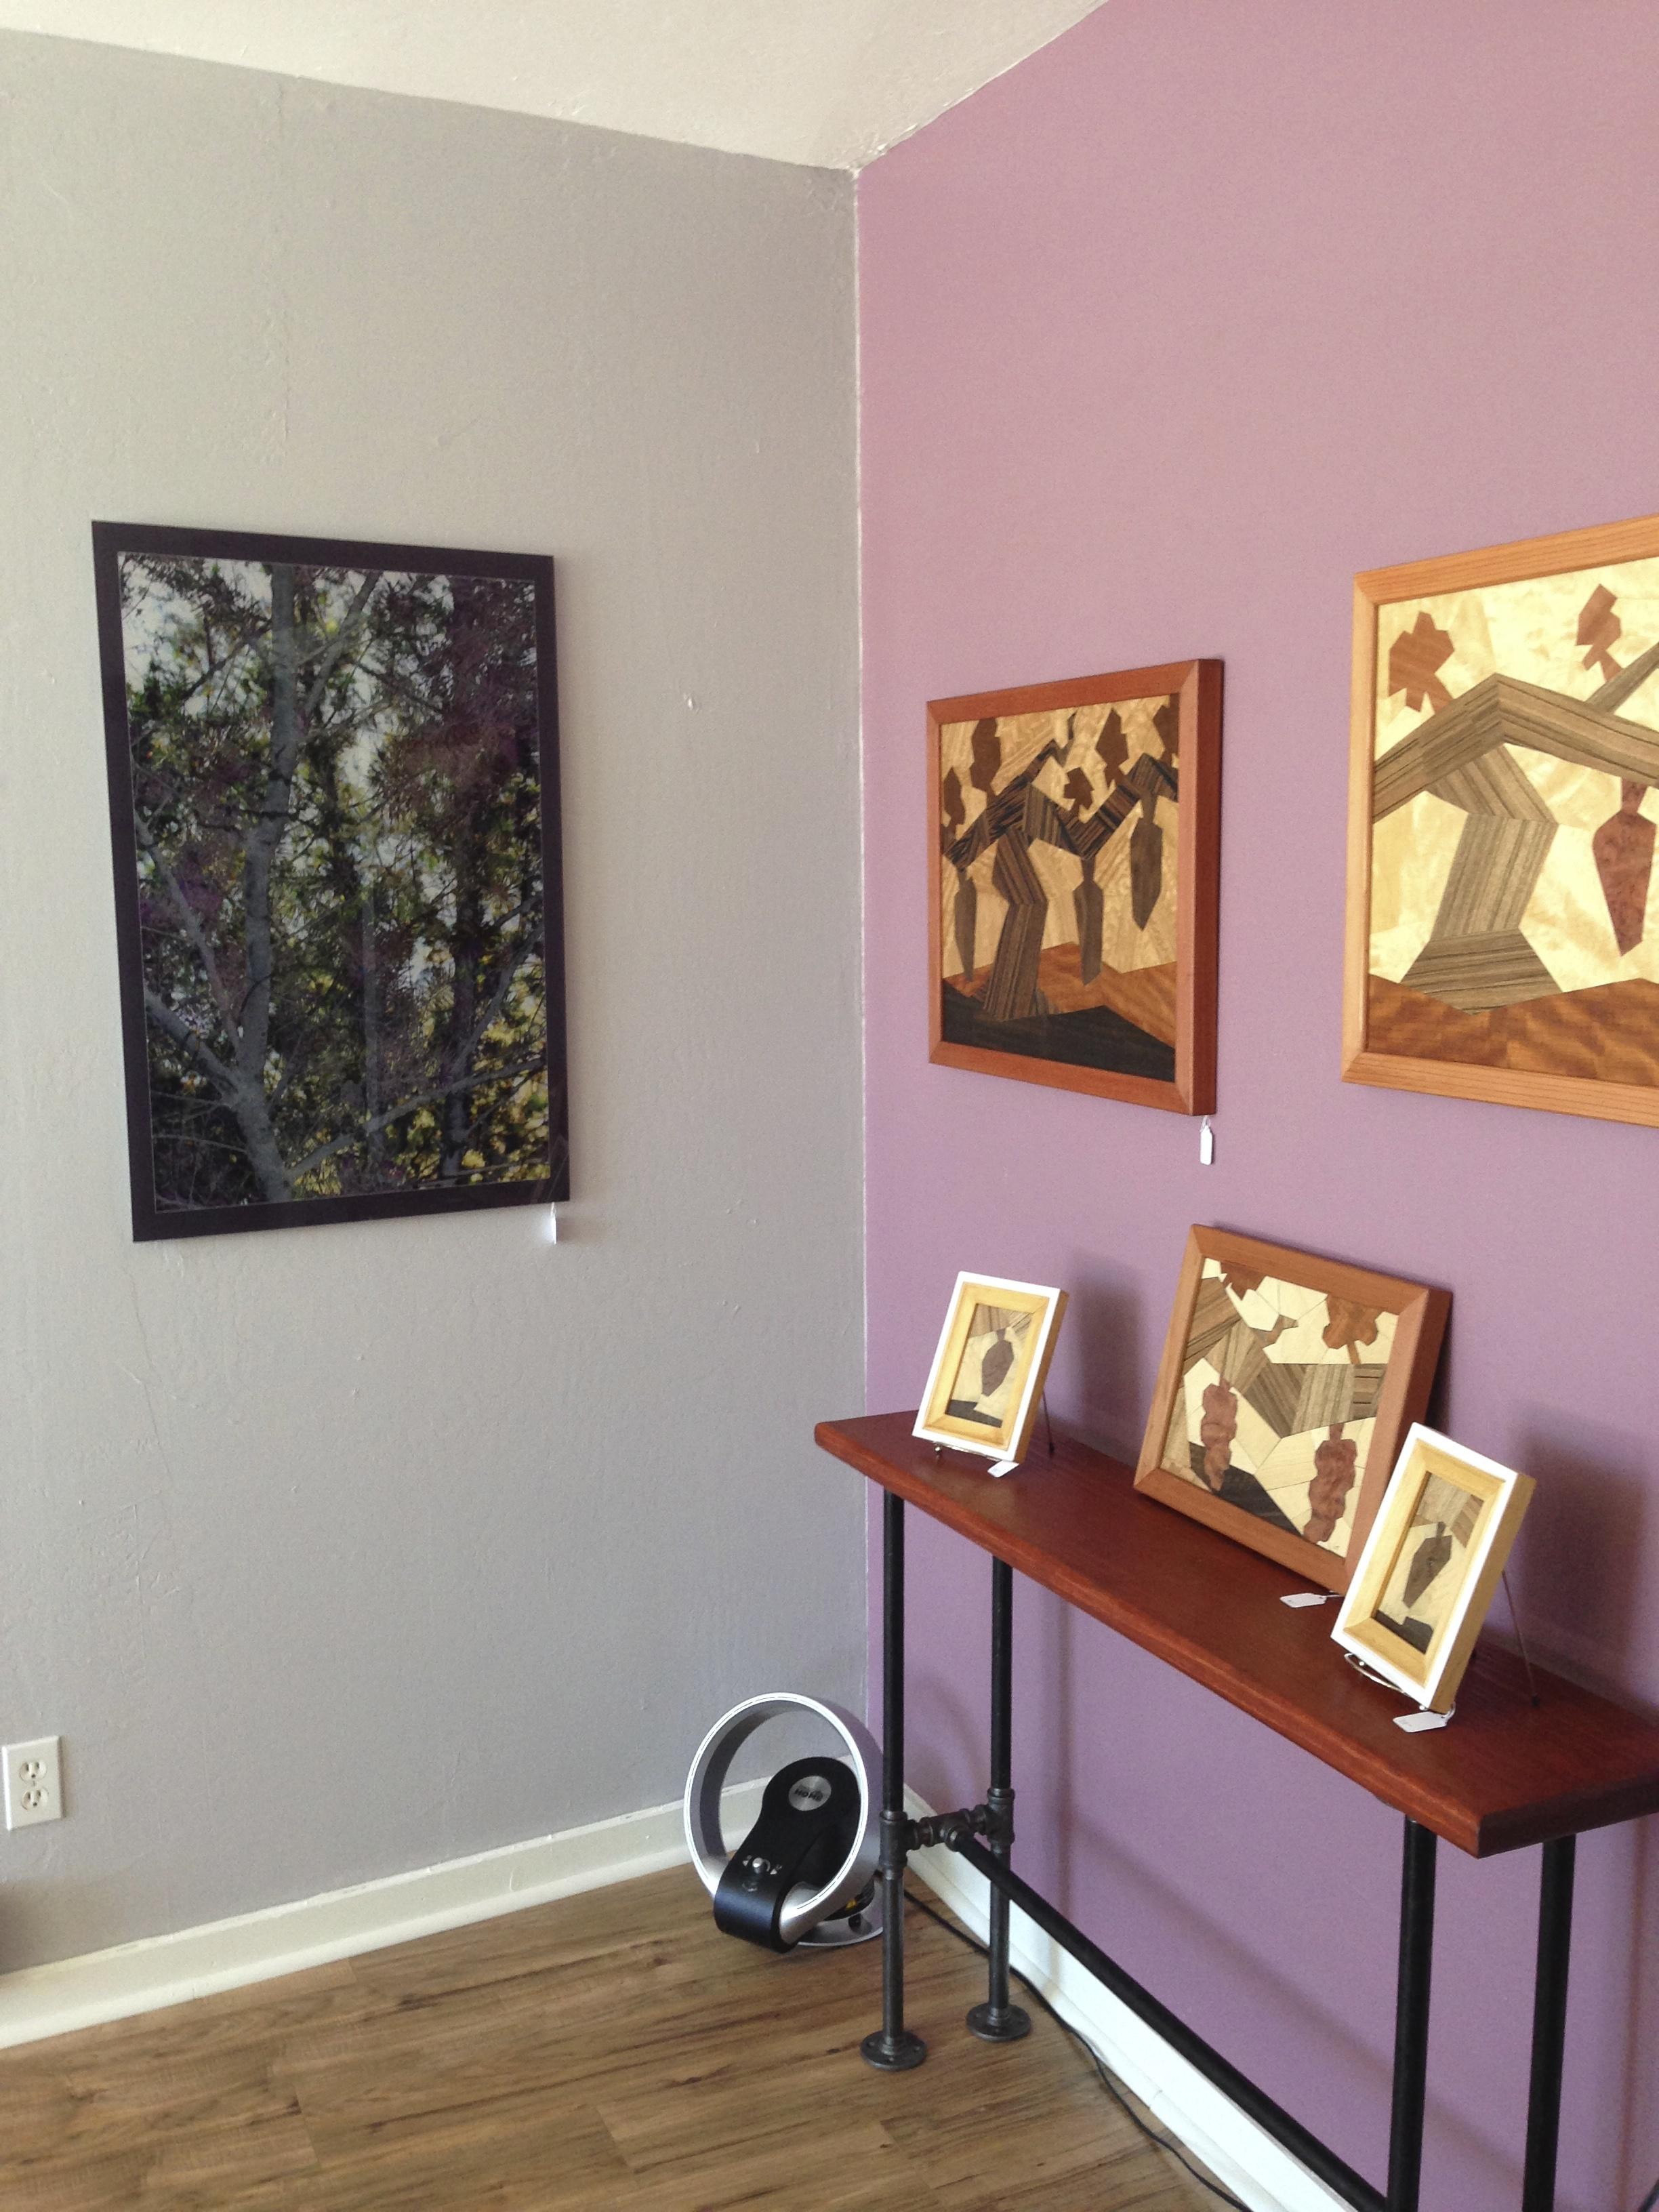 Grapevine Series - Wood Mosaics by Karen Cooprider